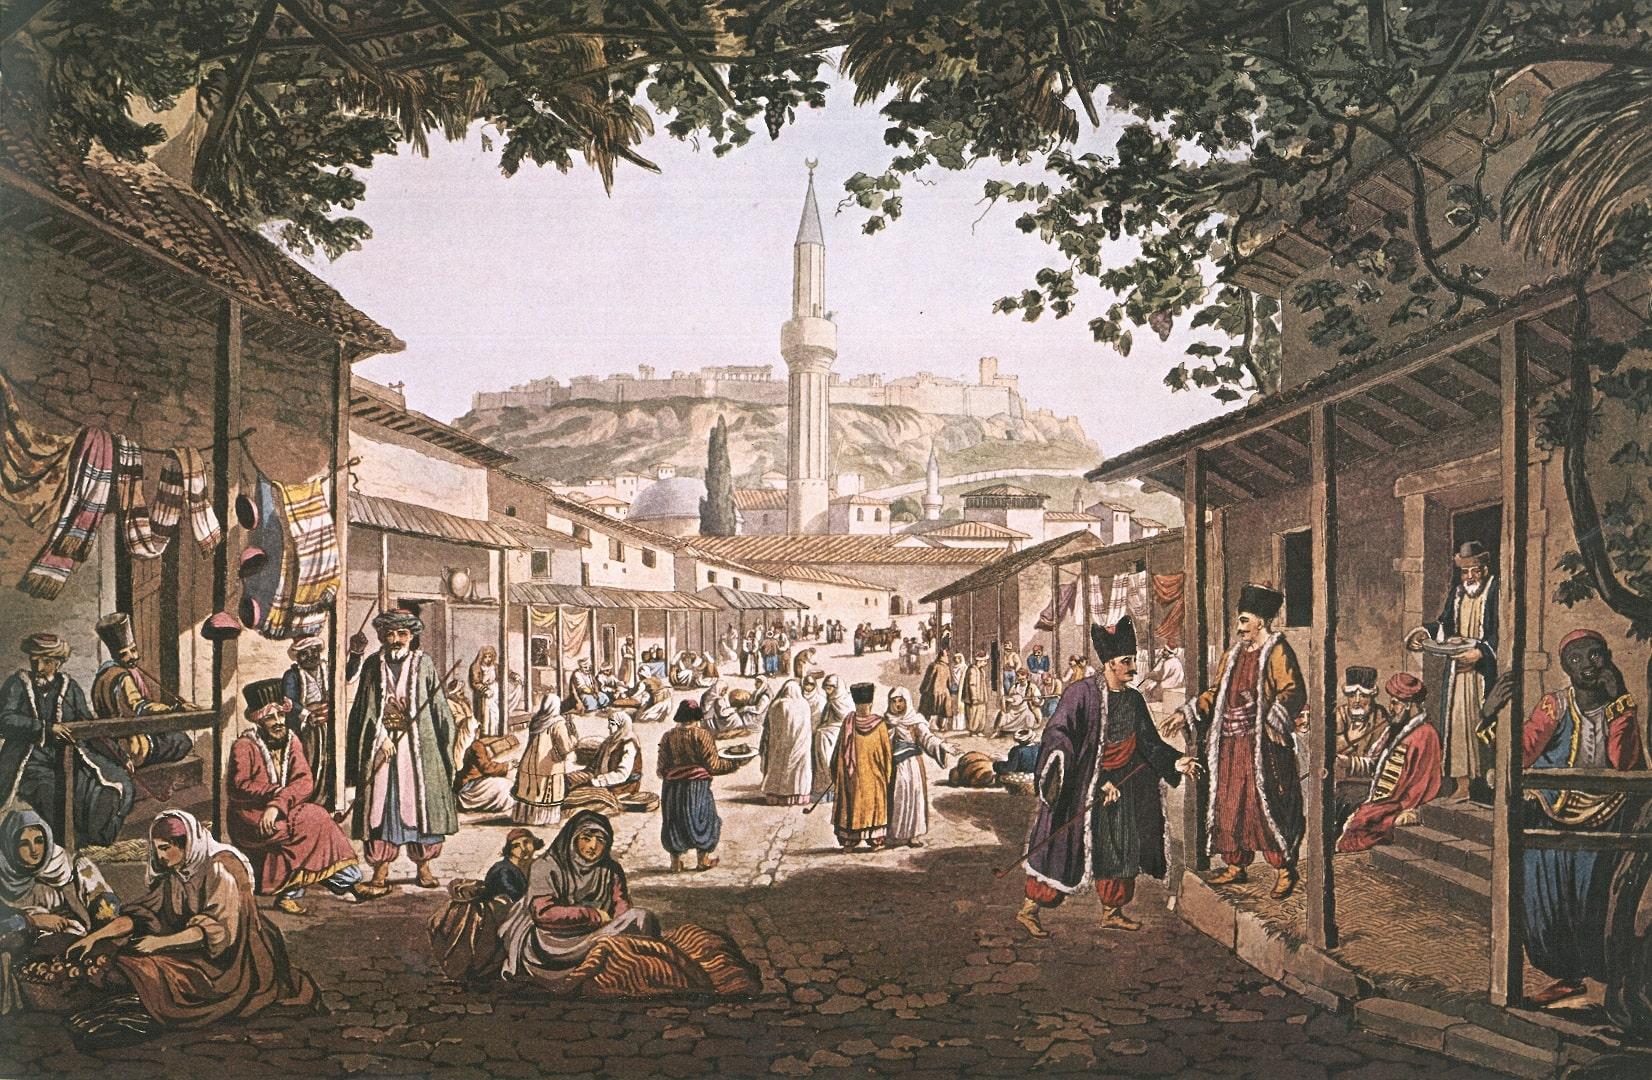 Ottoman Bazars of Athens | Wikimedia